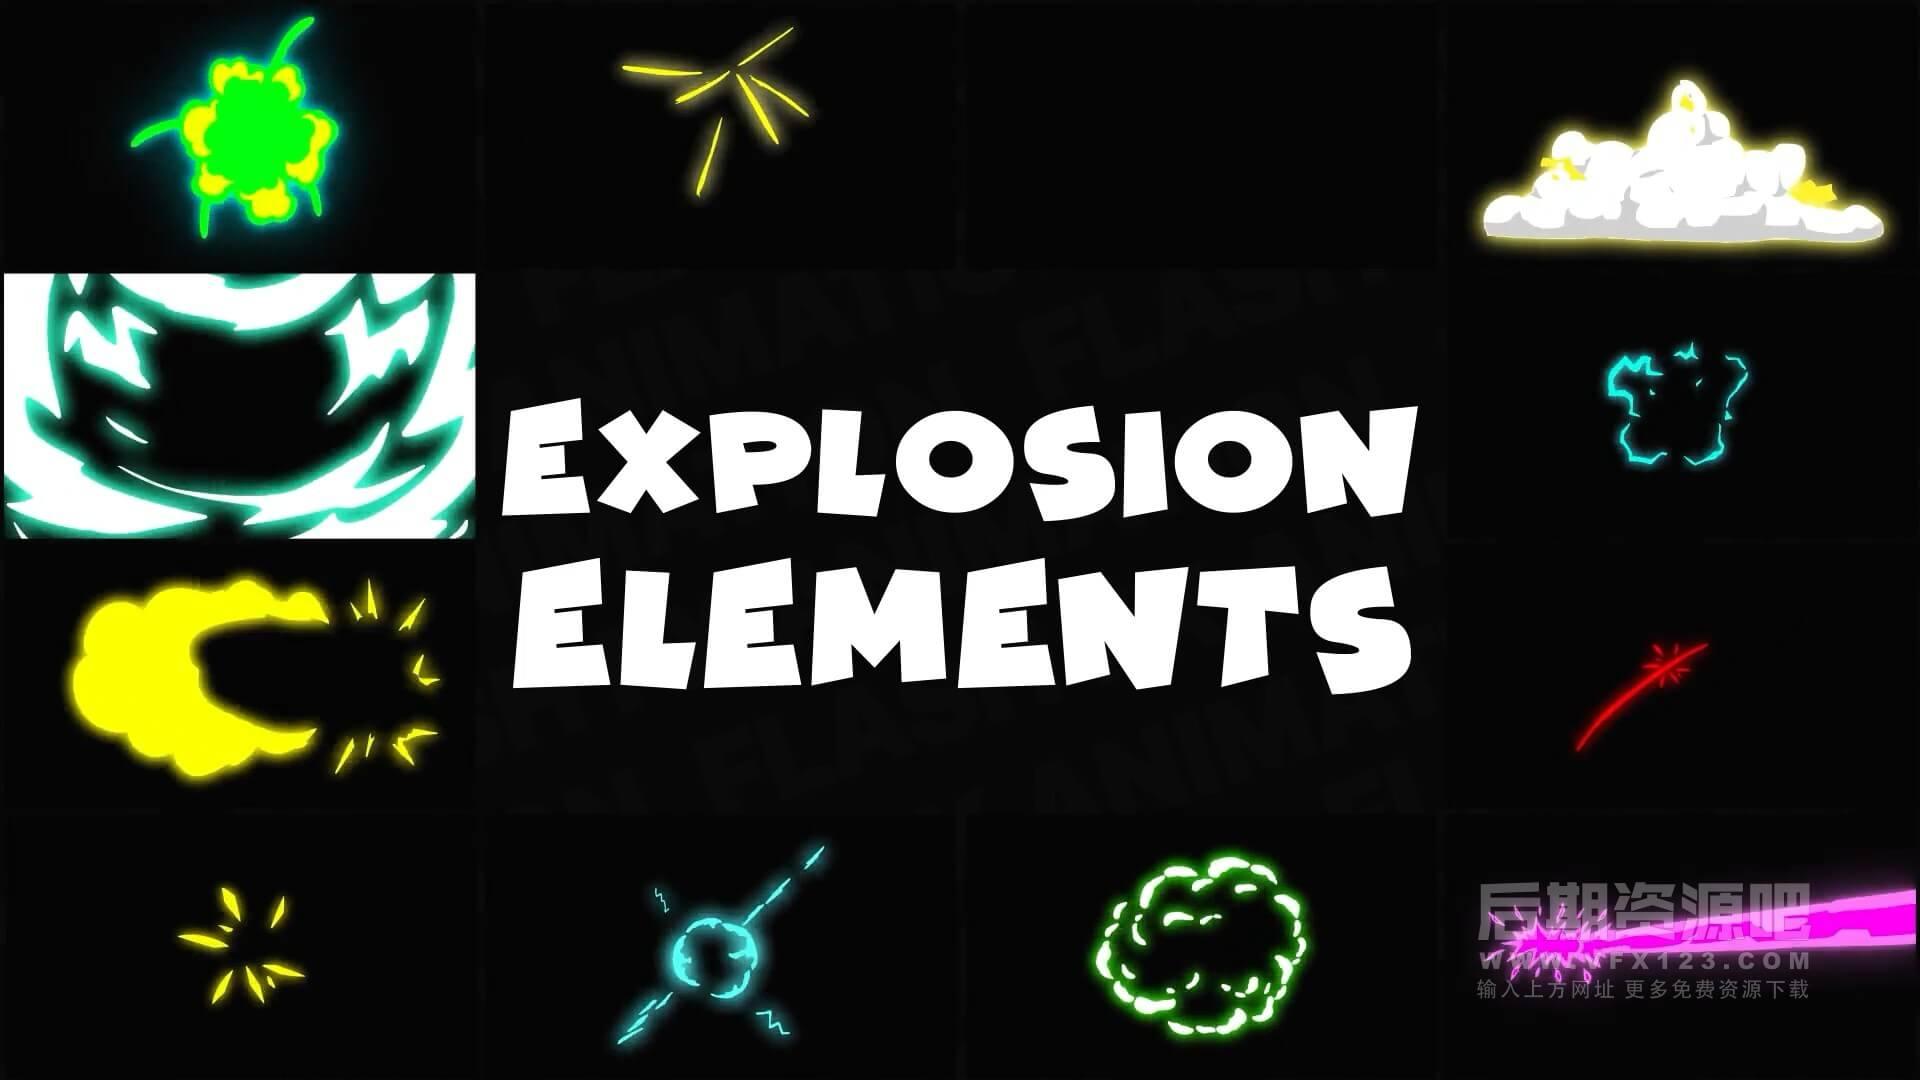 fcpx插件 卡通动漫能量爆炸MG动画元素集合 Explosion Elements